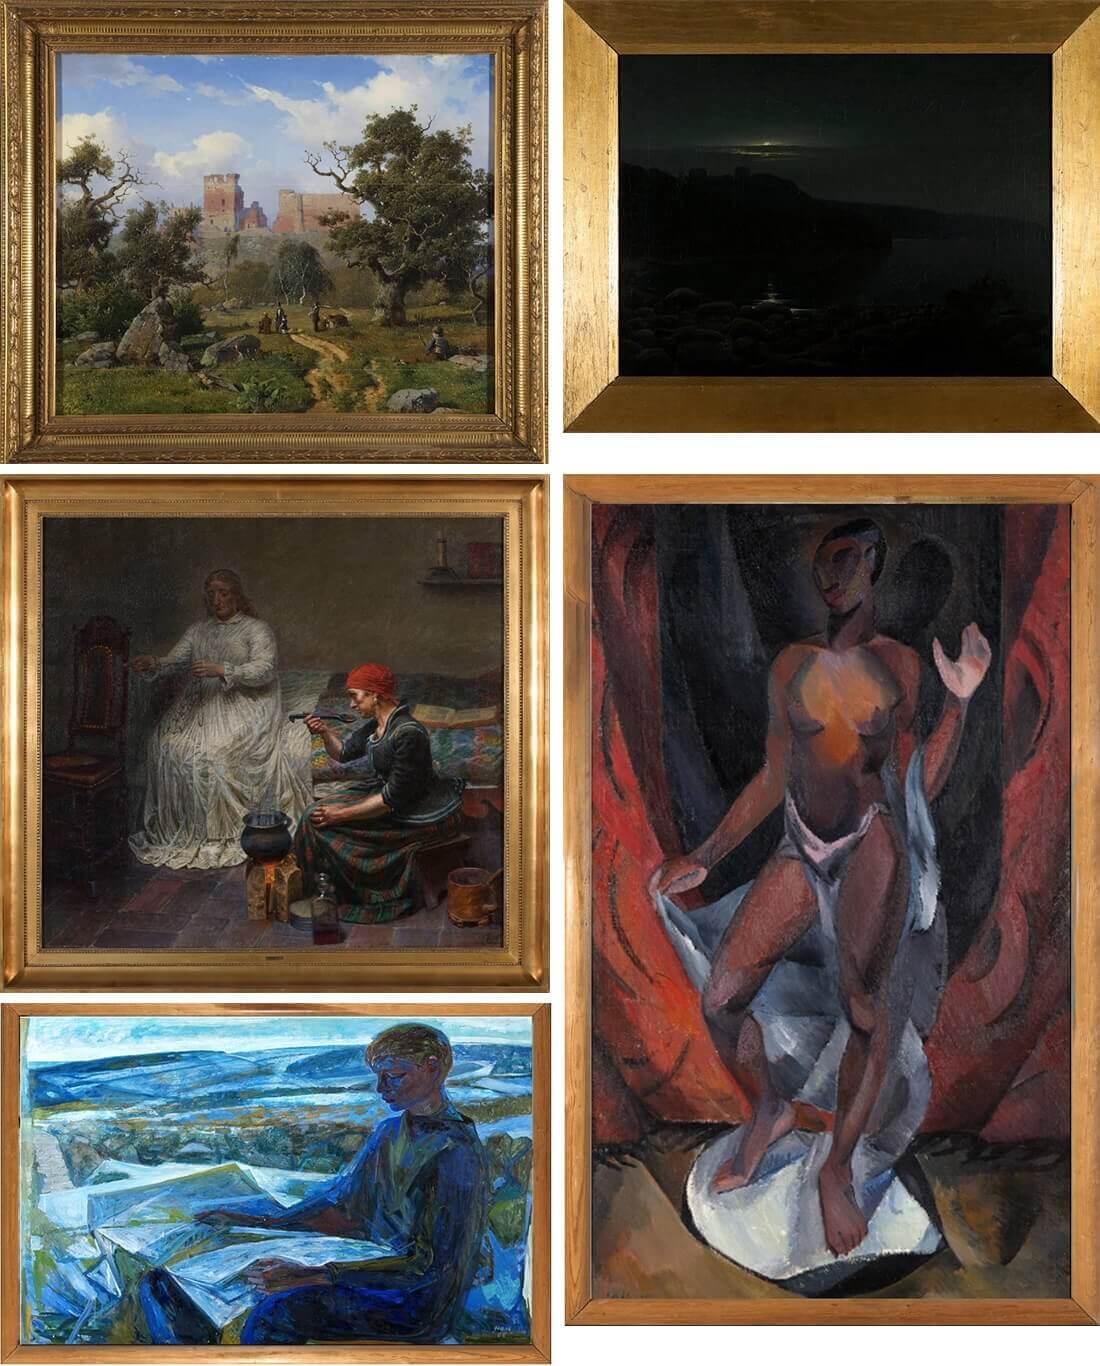 Bornholms kunstmuseum malerier kulturformidleren_dk